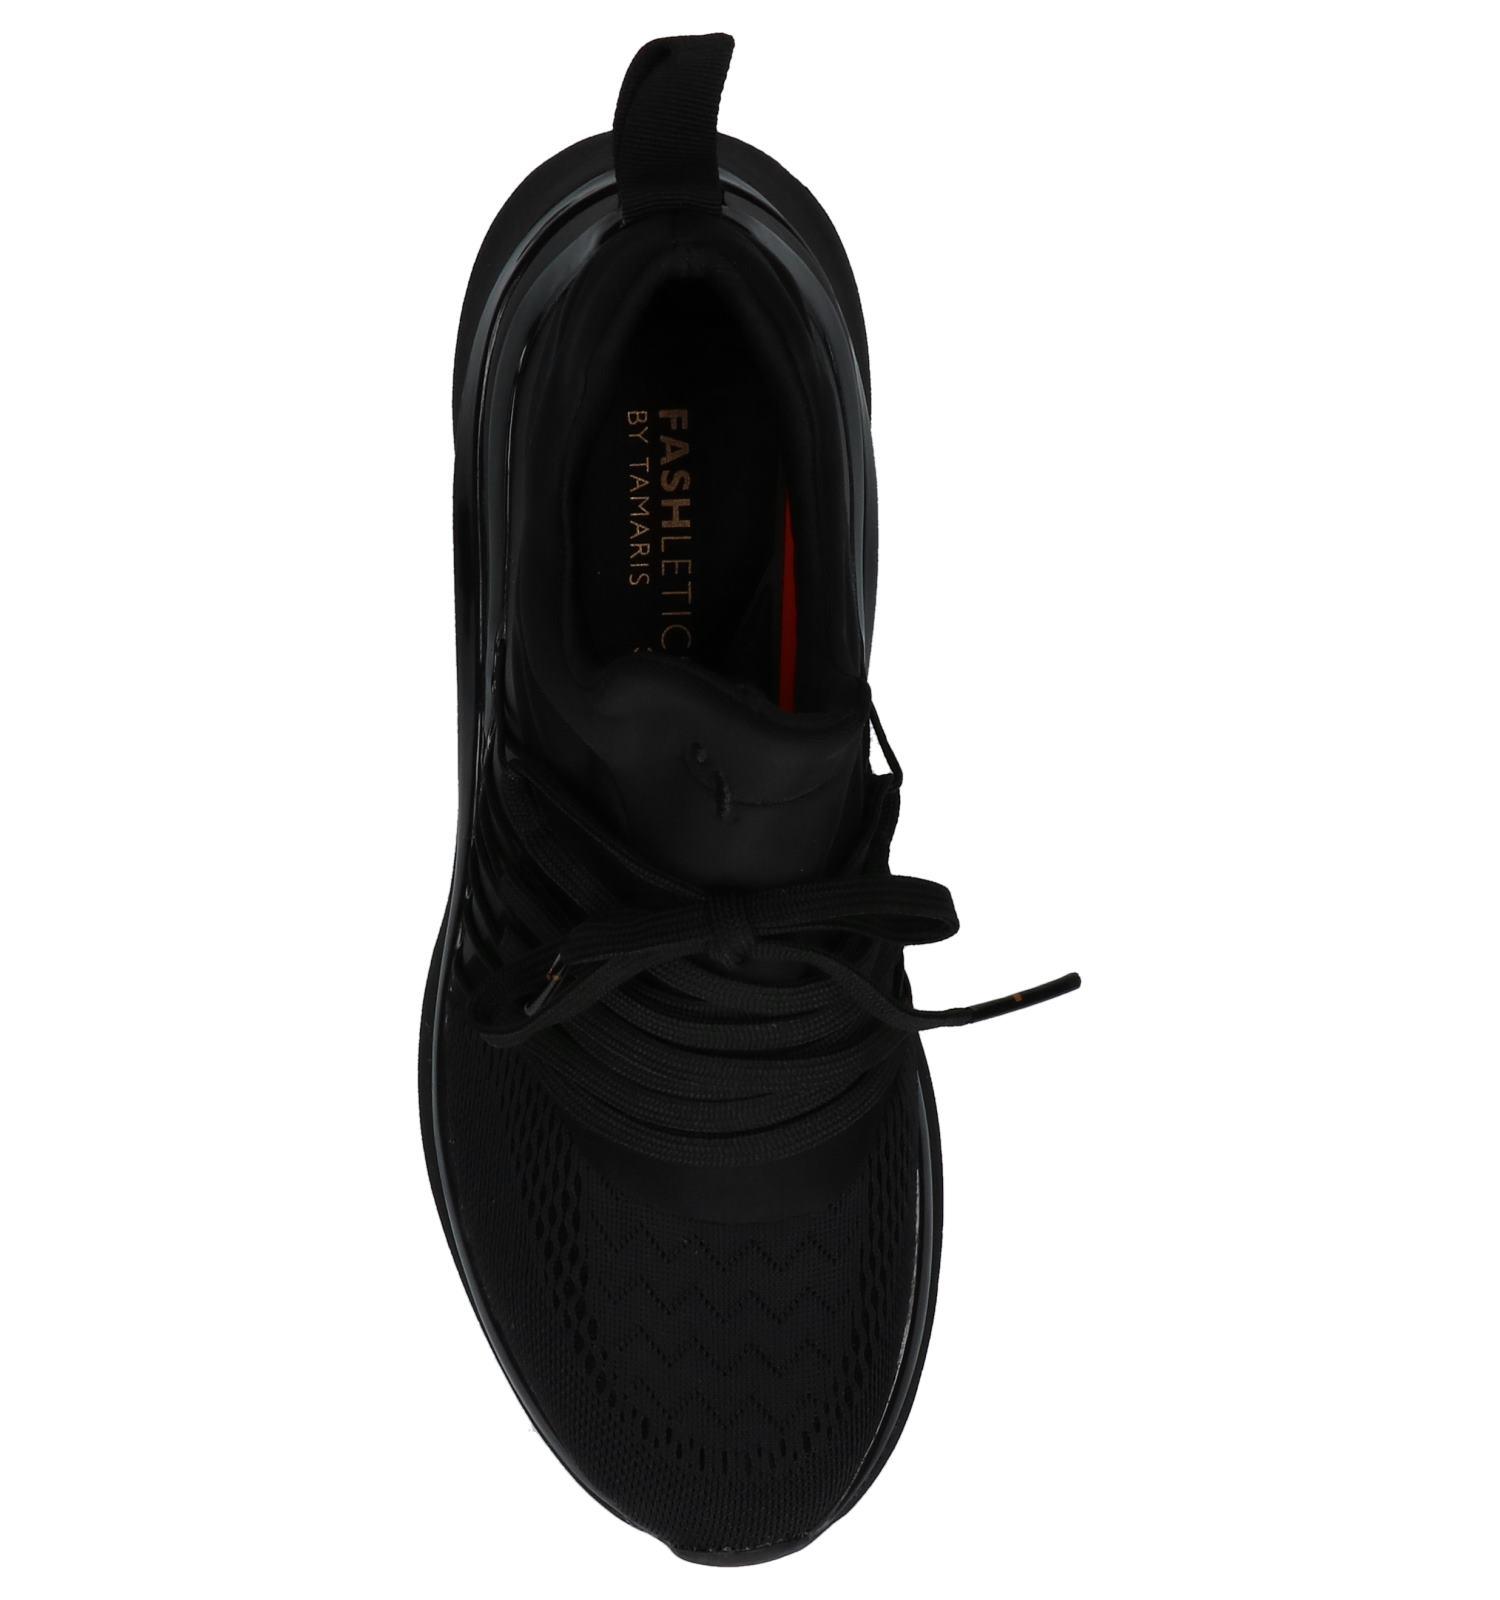 c78a4aa4128 Tamaris Fashletics Zwarte Sneakers | TORFS.BE | Gratis verzend en retour